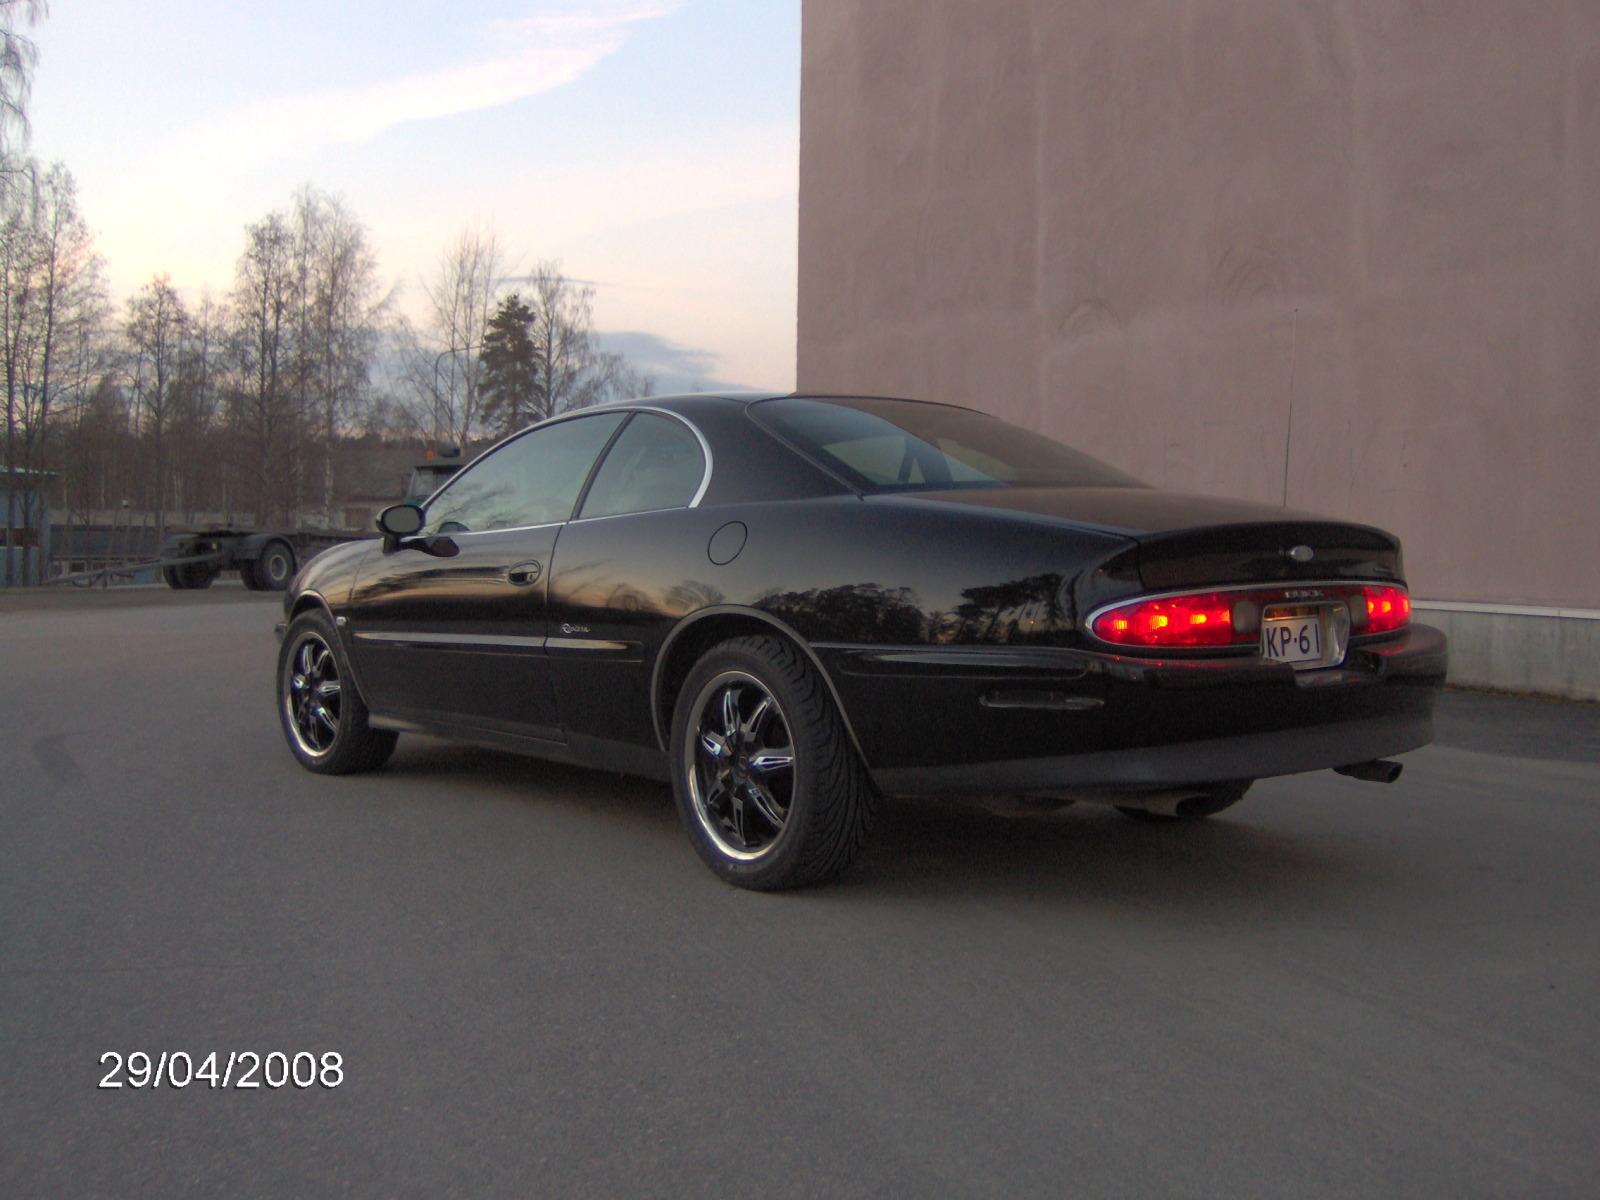 Finnish (ok, Canadian originally :) '97 Riviera resurrection. Hwioh5